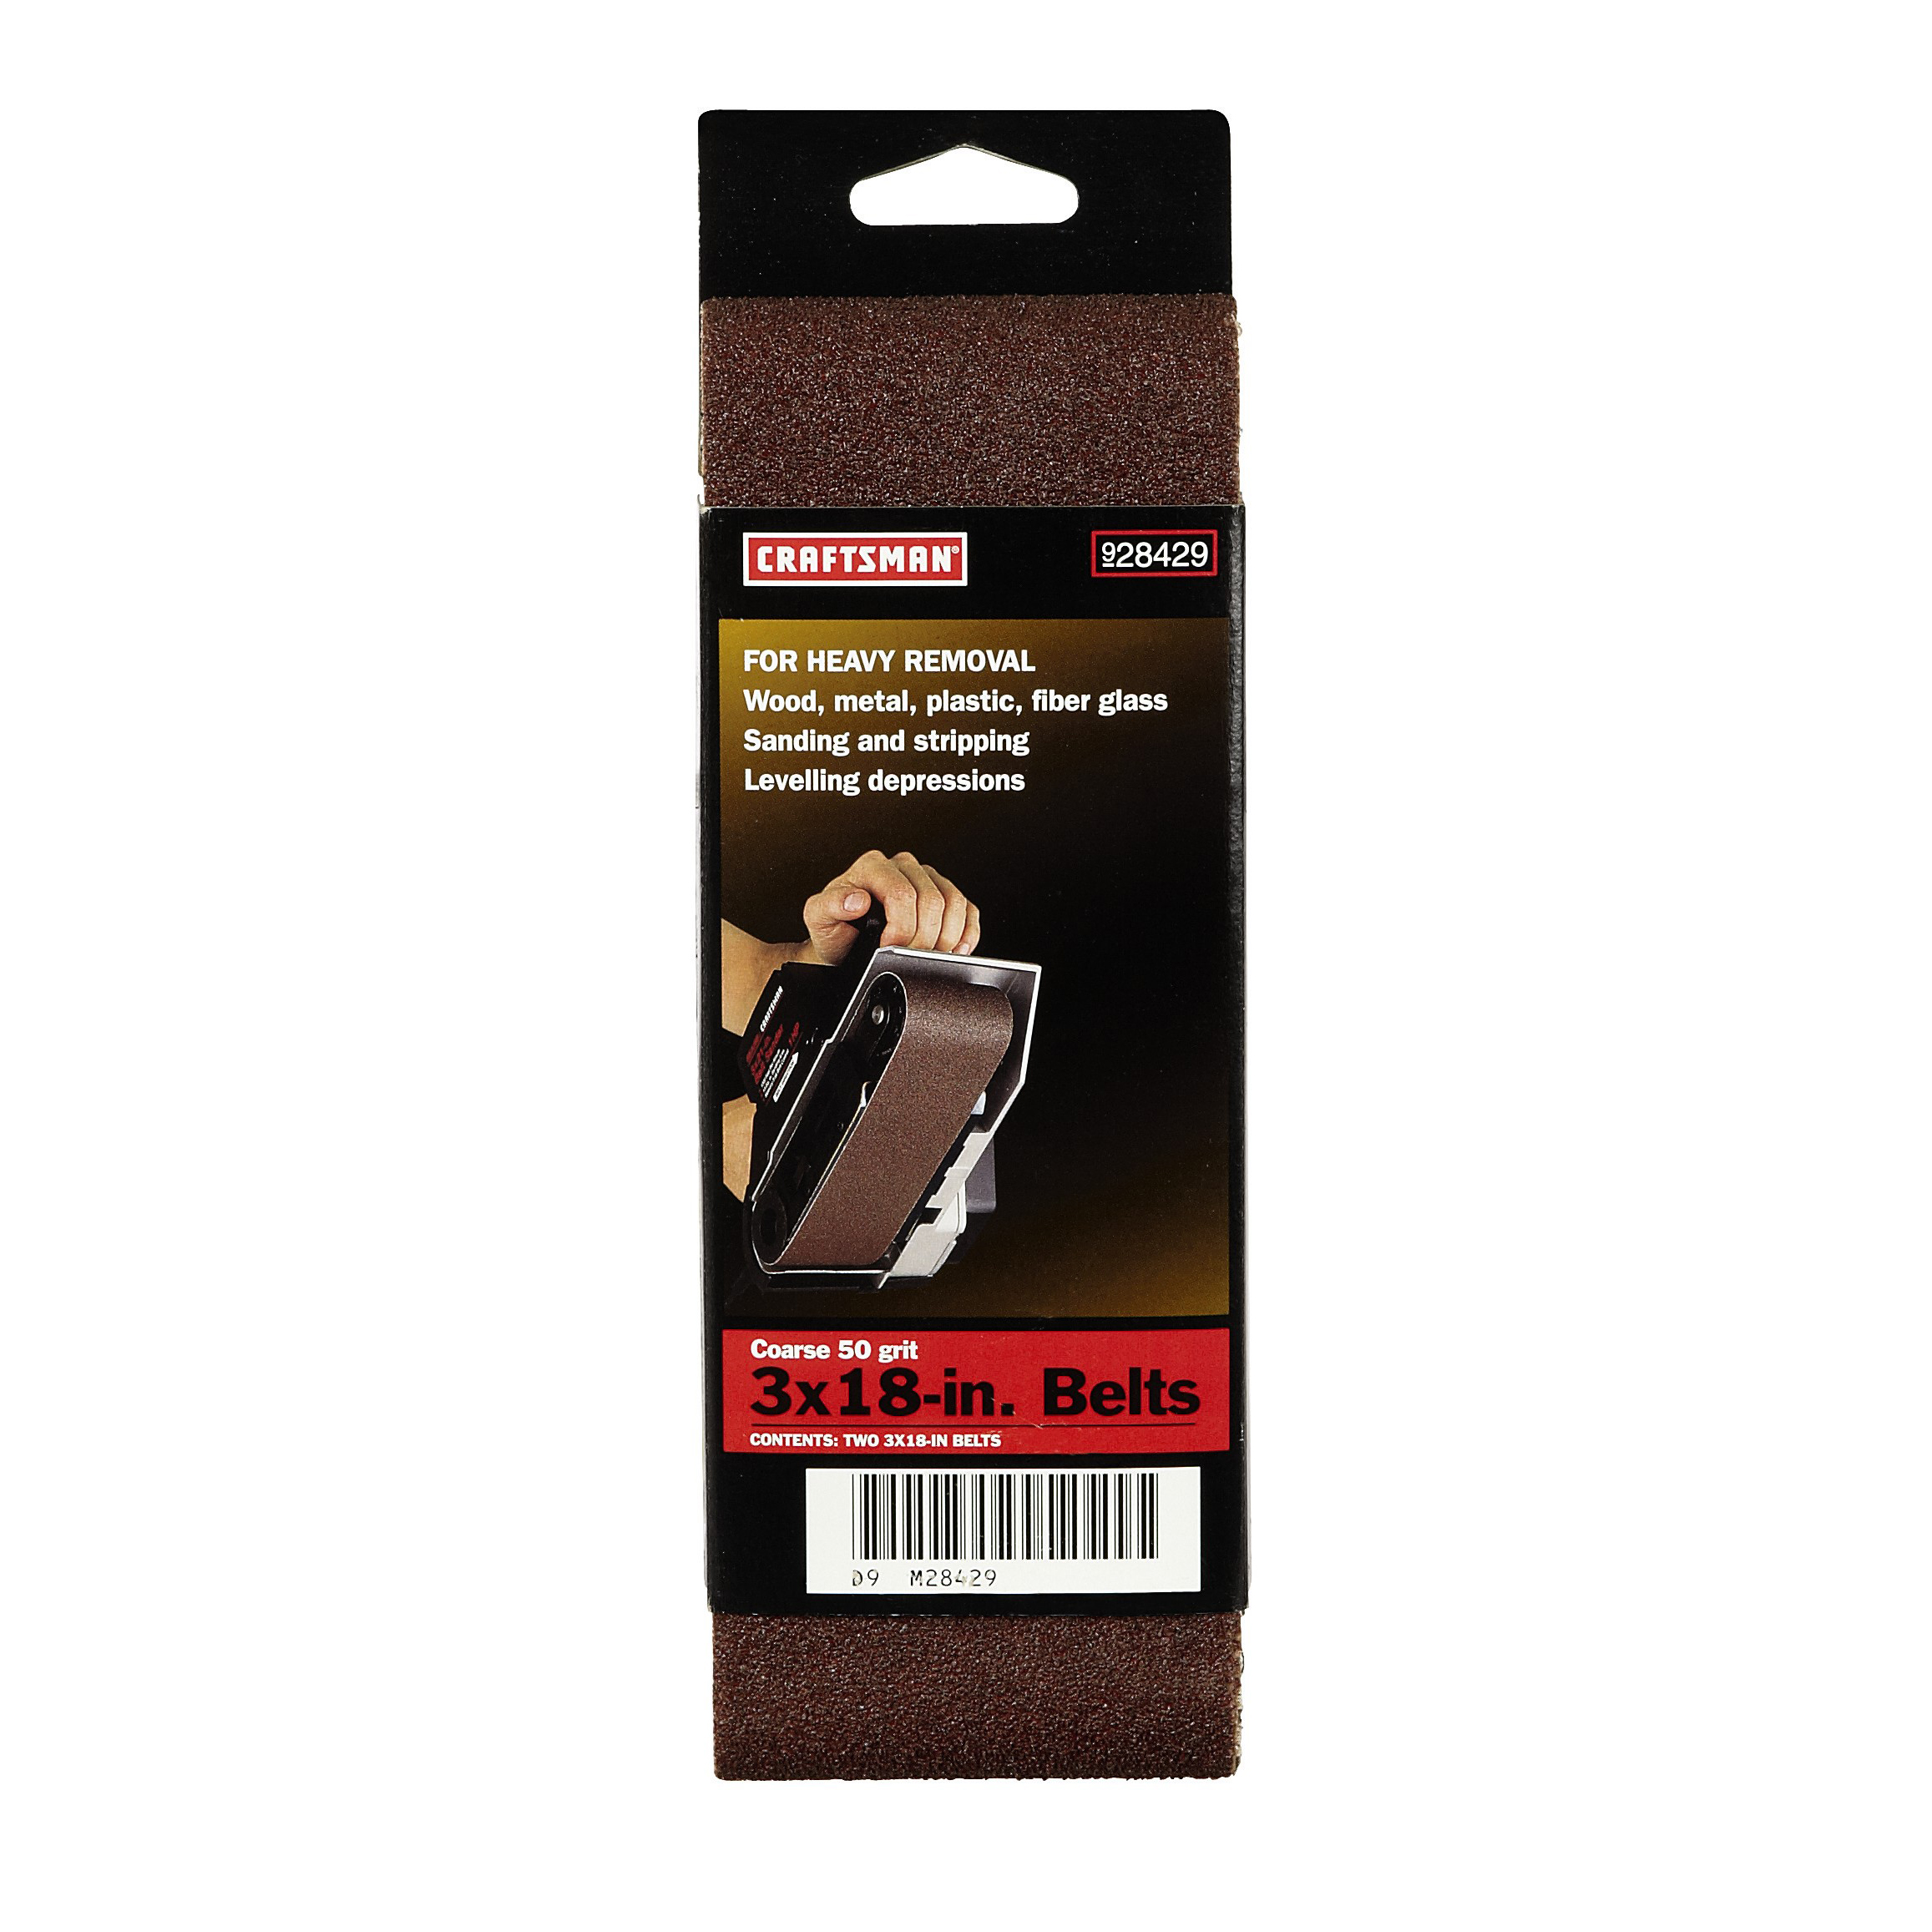 Craftsman 3 x 18 in. 50 Grit Belt, 2 pk.